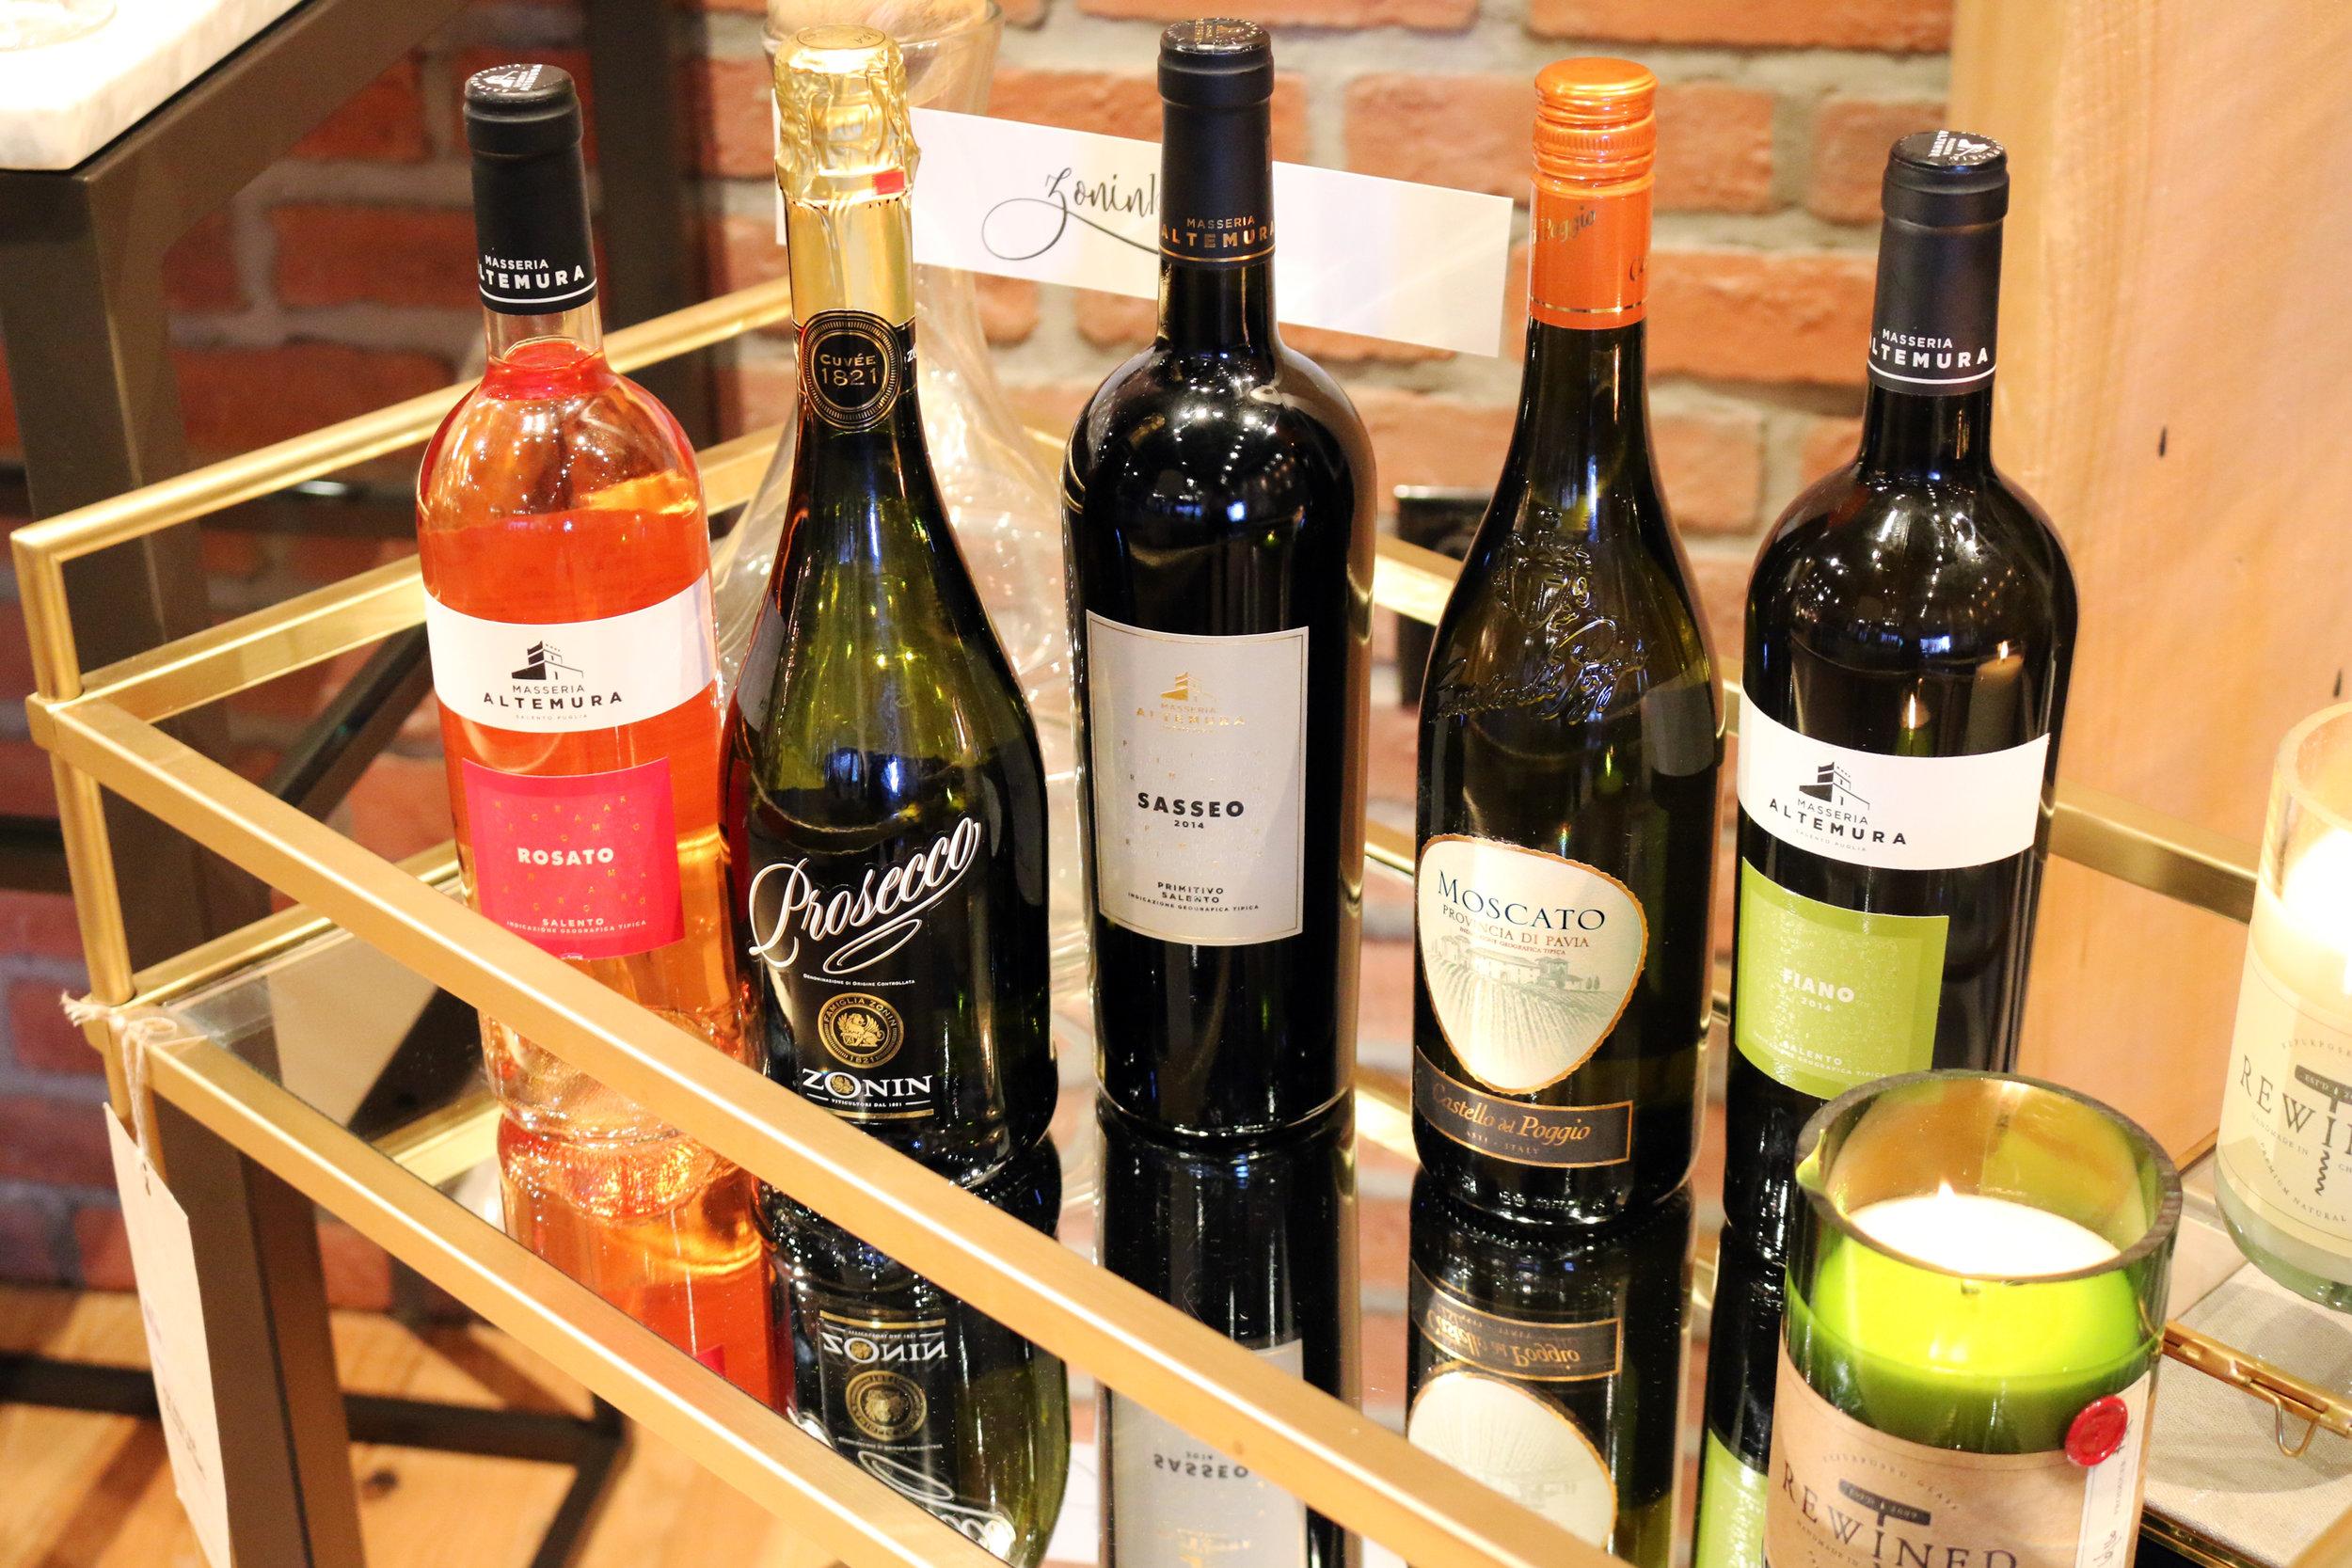 Miami wine events with ZONIN1821 wines